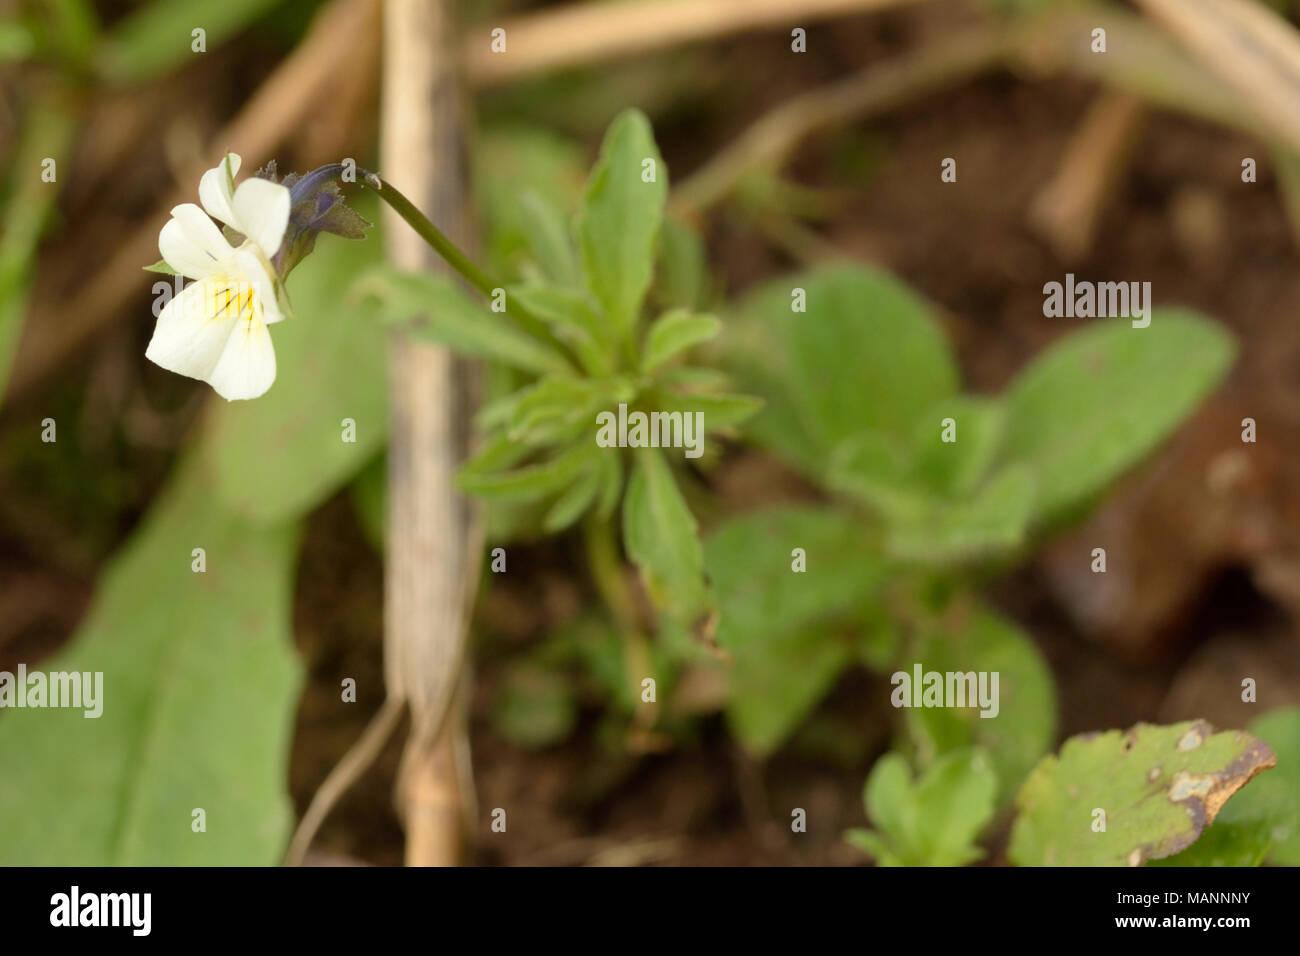 Field Pansy, Viola arvensis - Stock Image